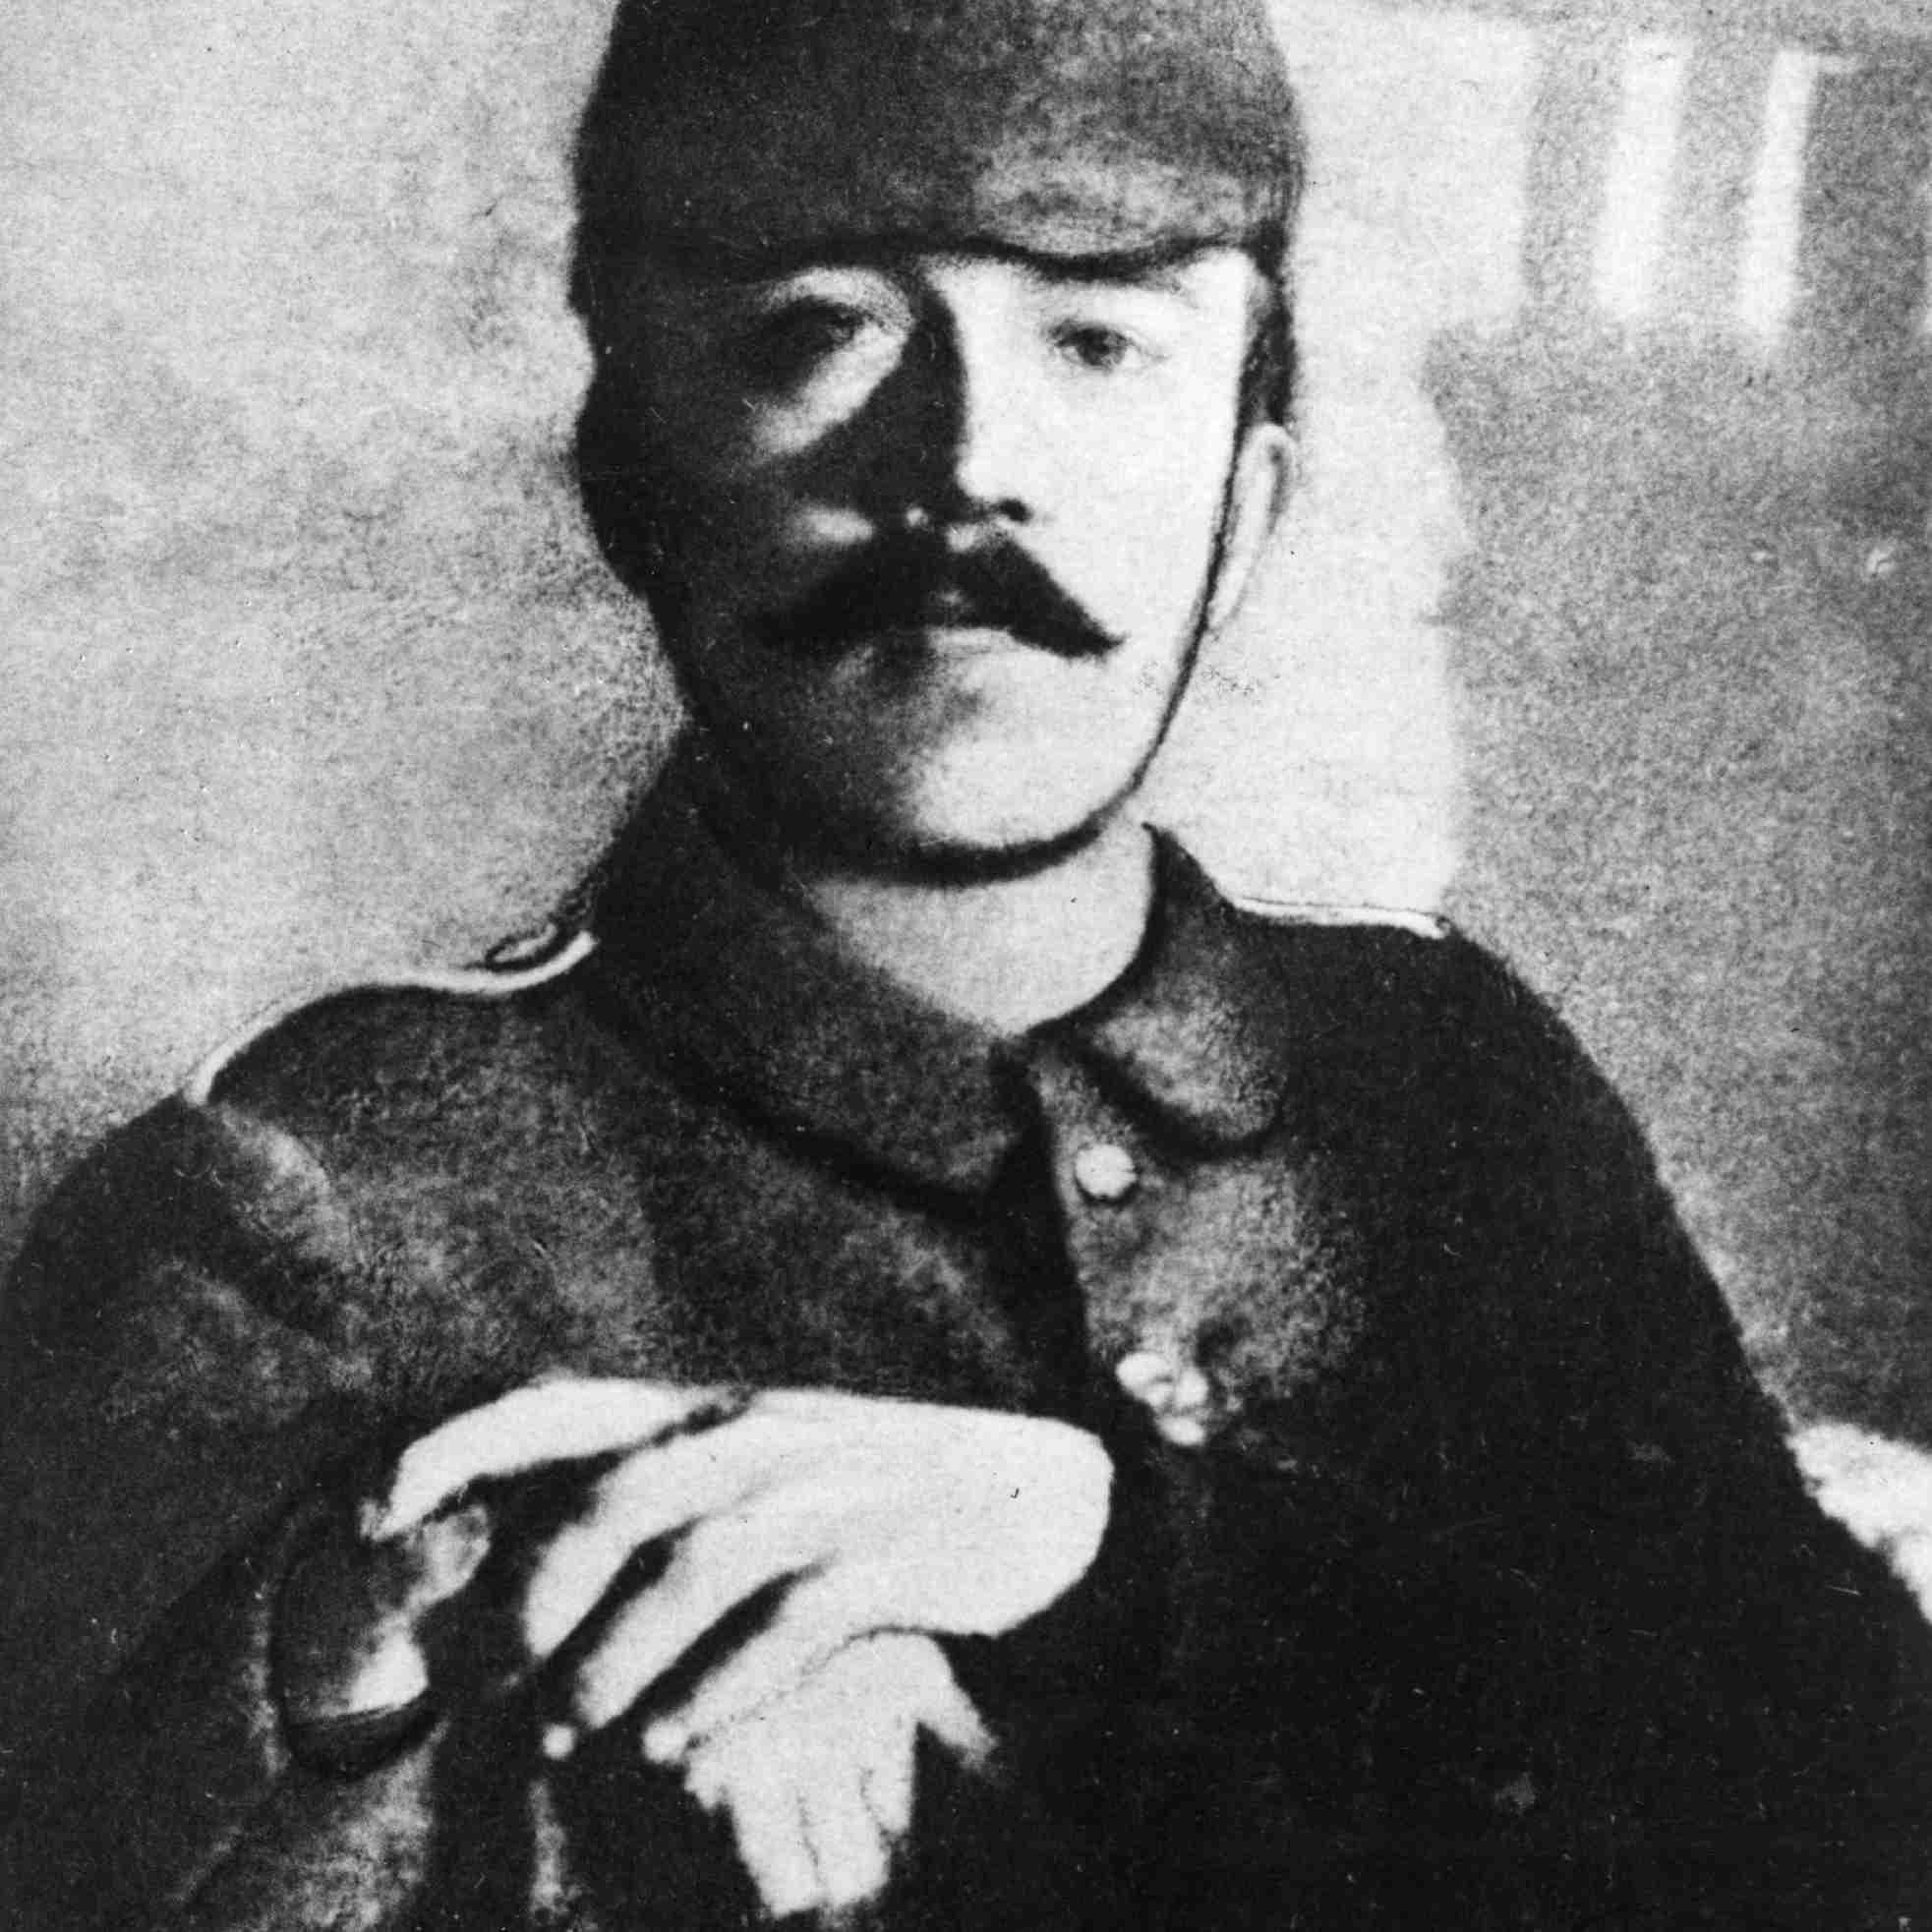 Adolf Hitler circa 1915 dressed in his field uniform during World War I.